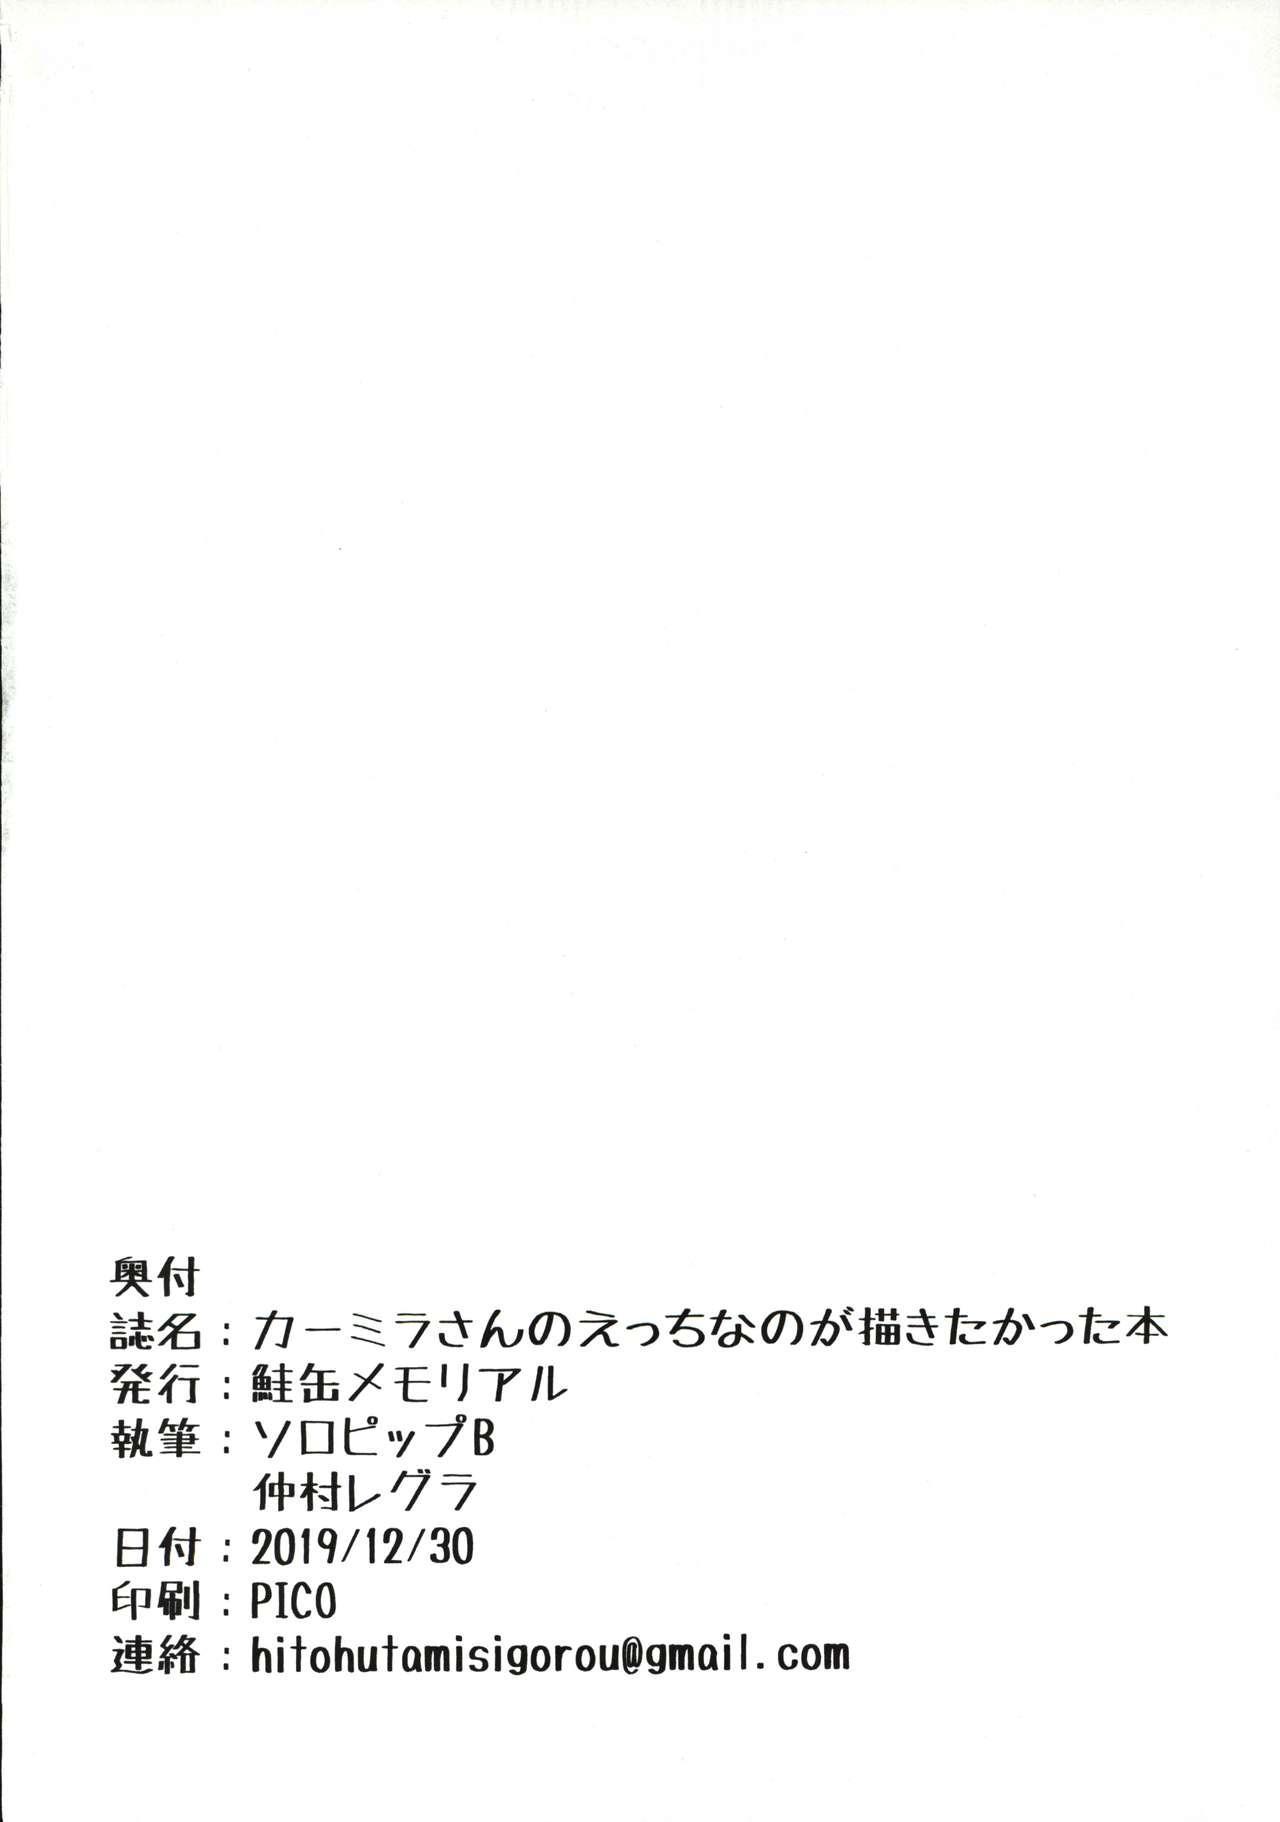 Carmilla-san no Ecchi na no ga Kakitakatta Hon 29